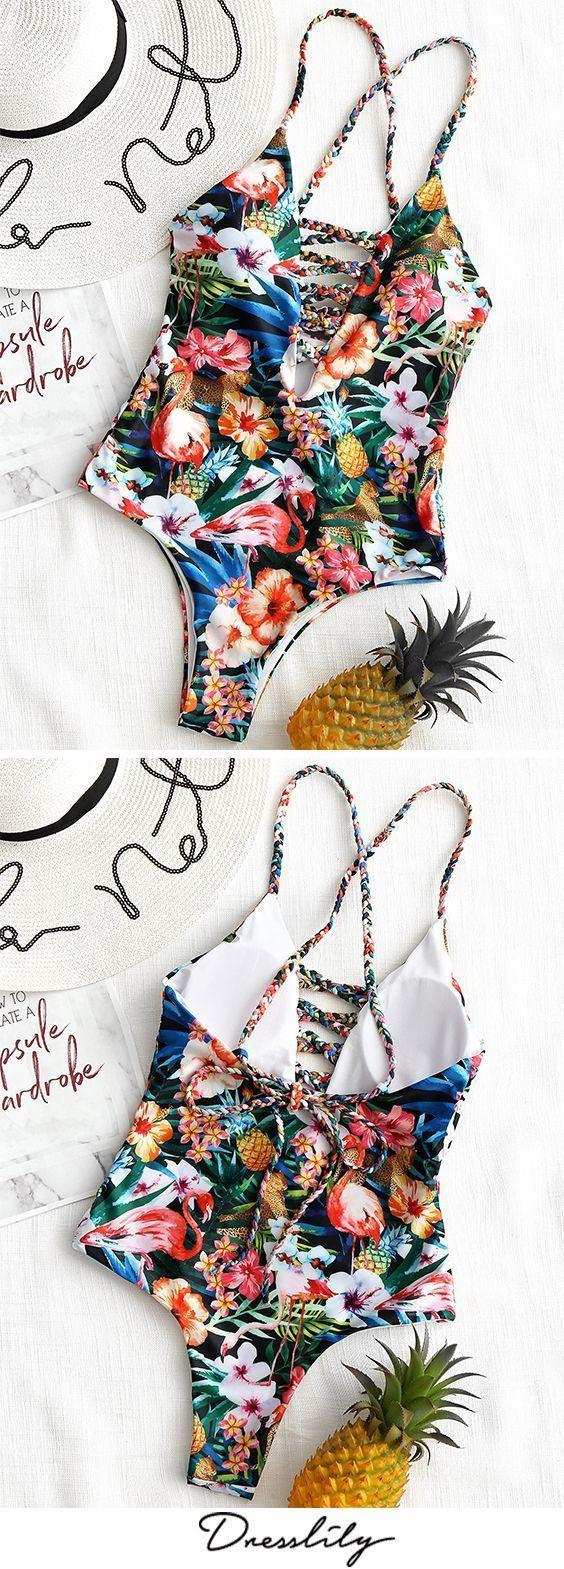 Buy New Swimwear,Shop the Latest Womens Bathing Suits, Swimsuits, & Bikinis Online at Dresslily.com. FREE SHIPPING WORLDWIDE!#swimwear#swimsuit#onepieceswimsuit #Bikinis #suitingwomen